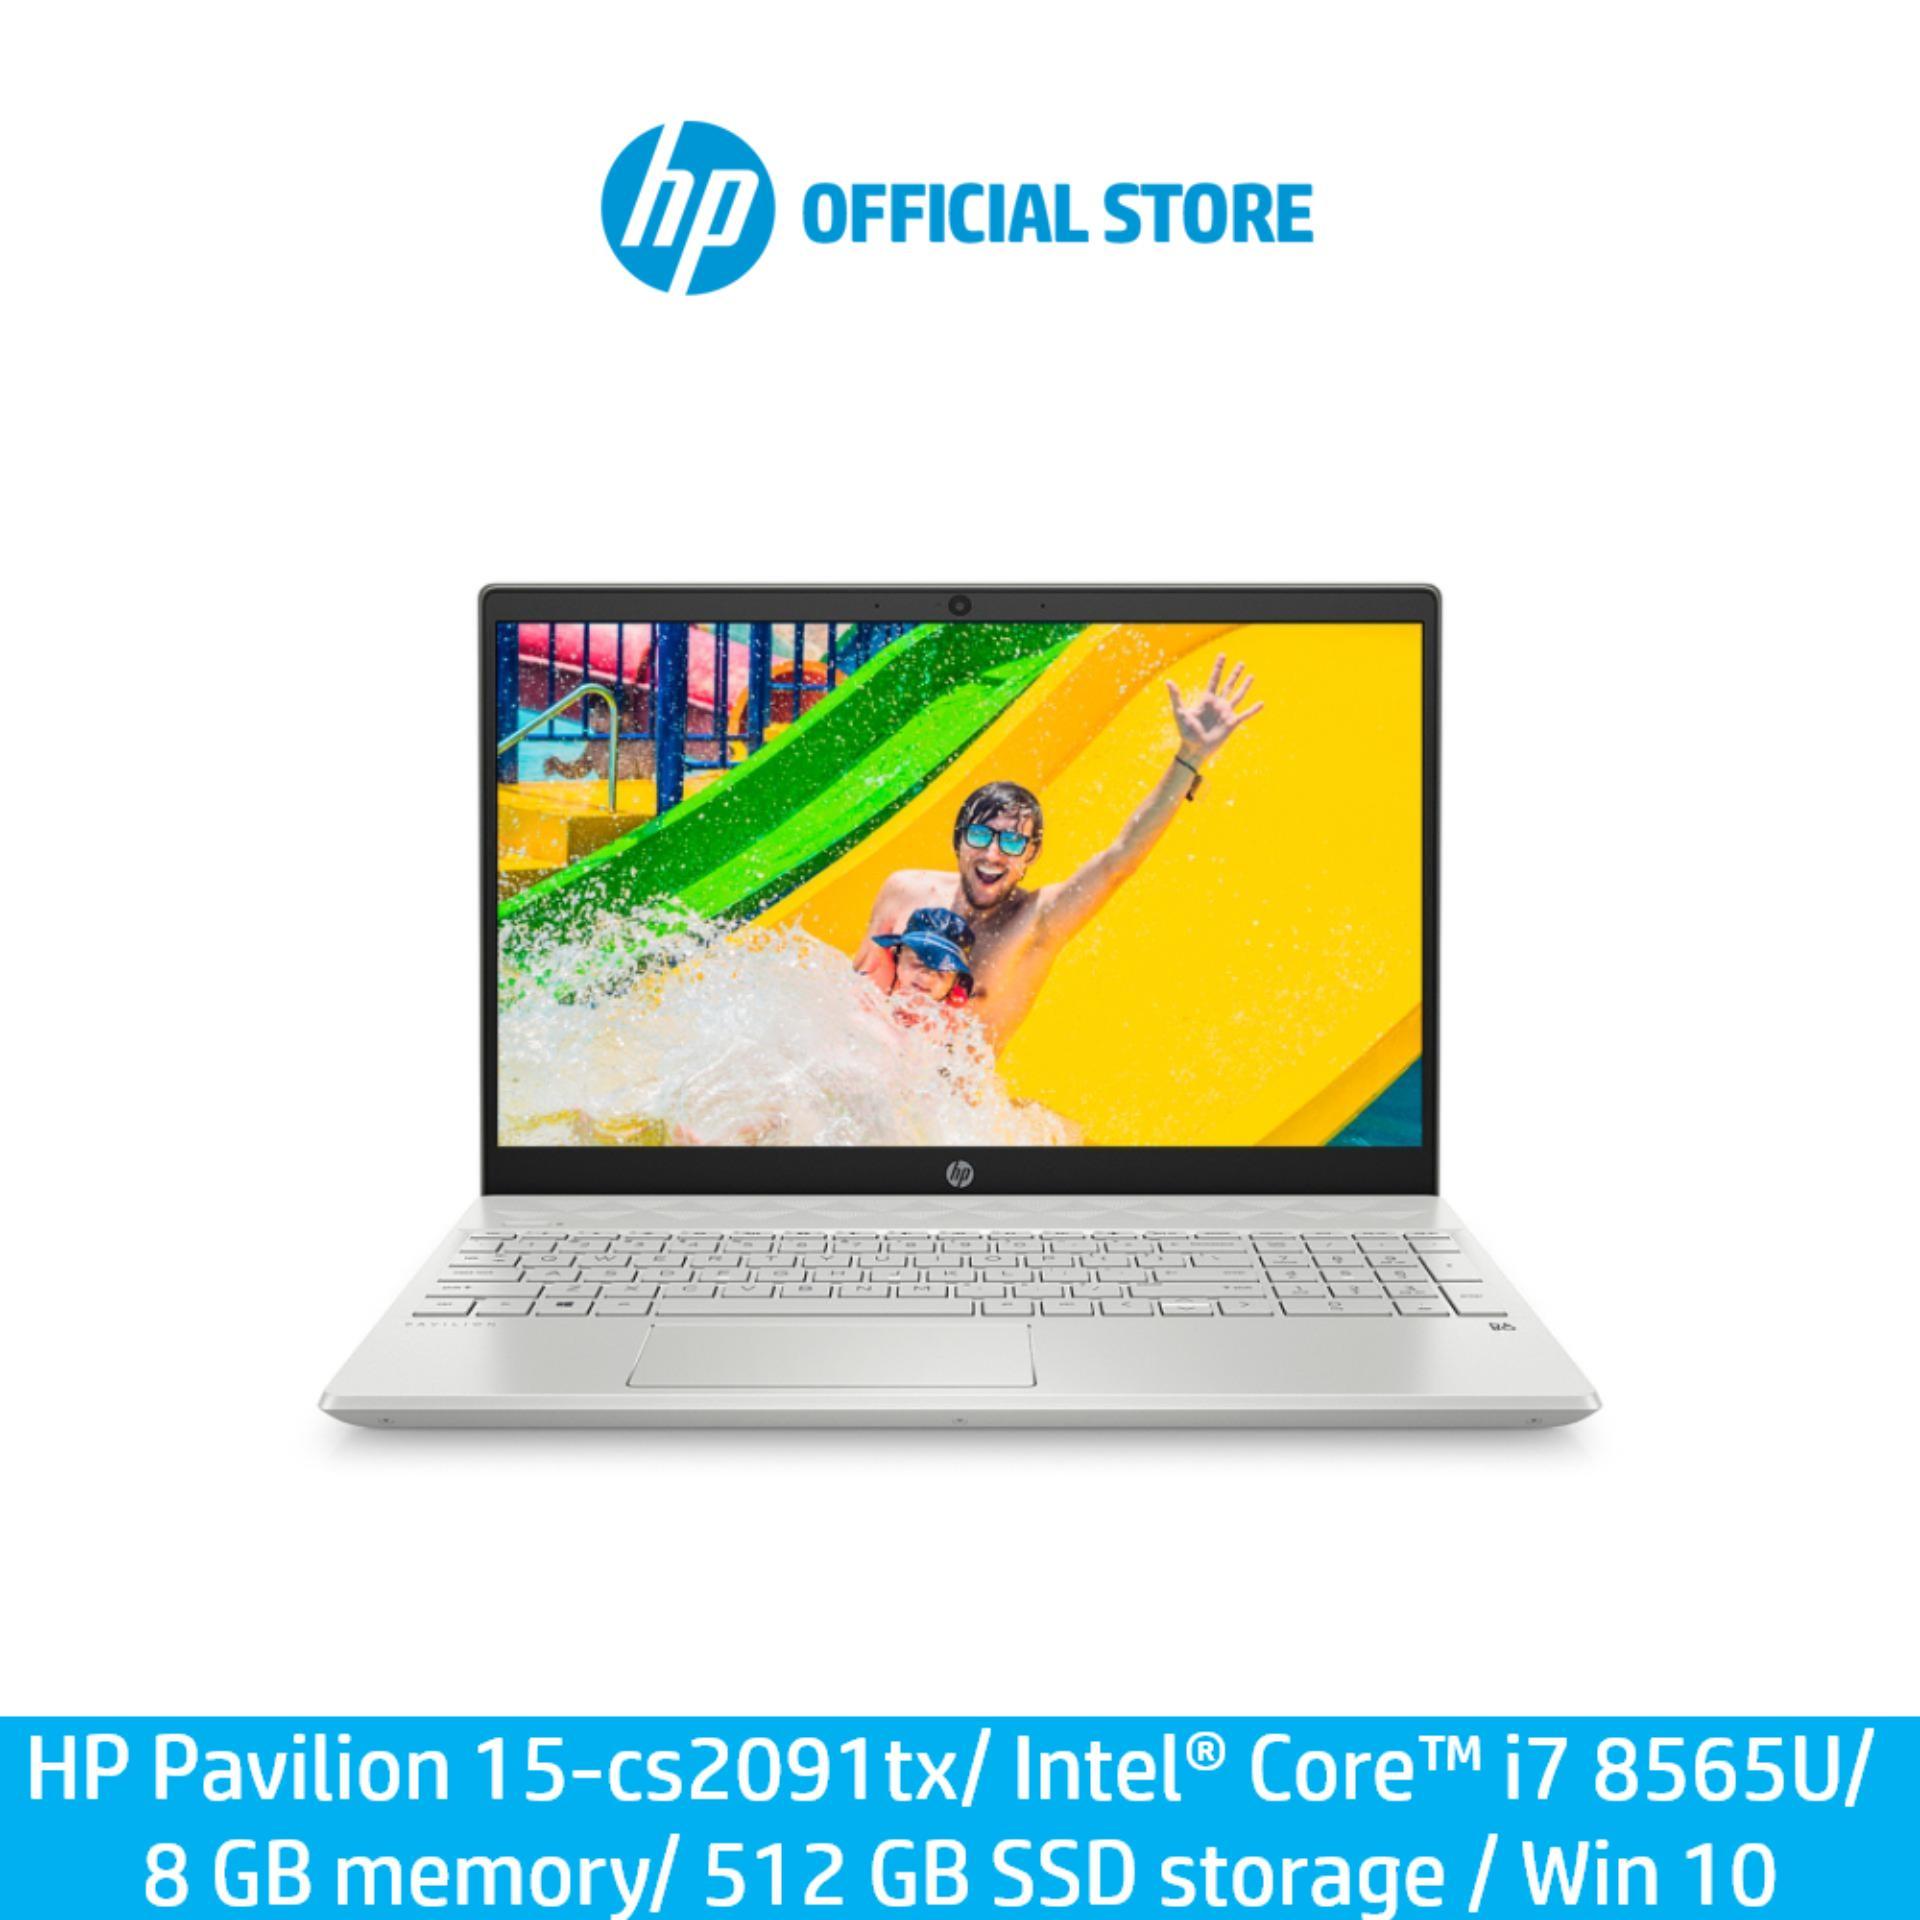 HP Pavilion 15-cs2091tx/ Intel® Core™ i7 8565U/ 8 GB memory/ 512 GB SSD storage / Win 10